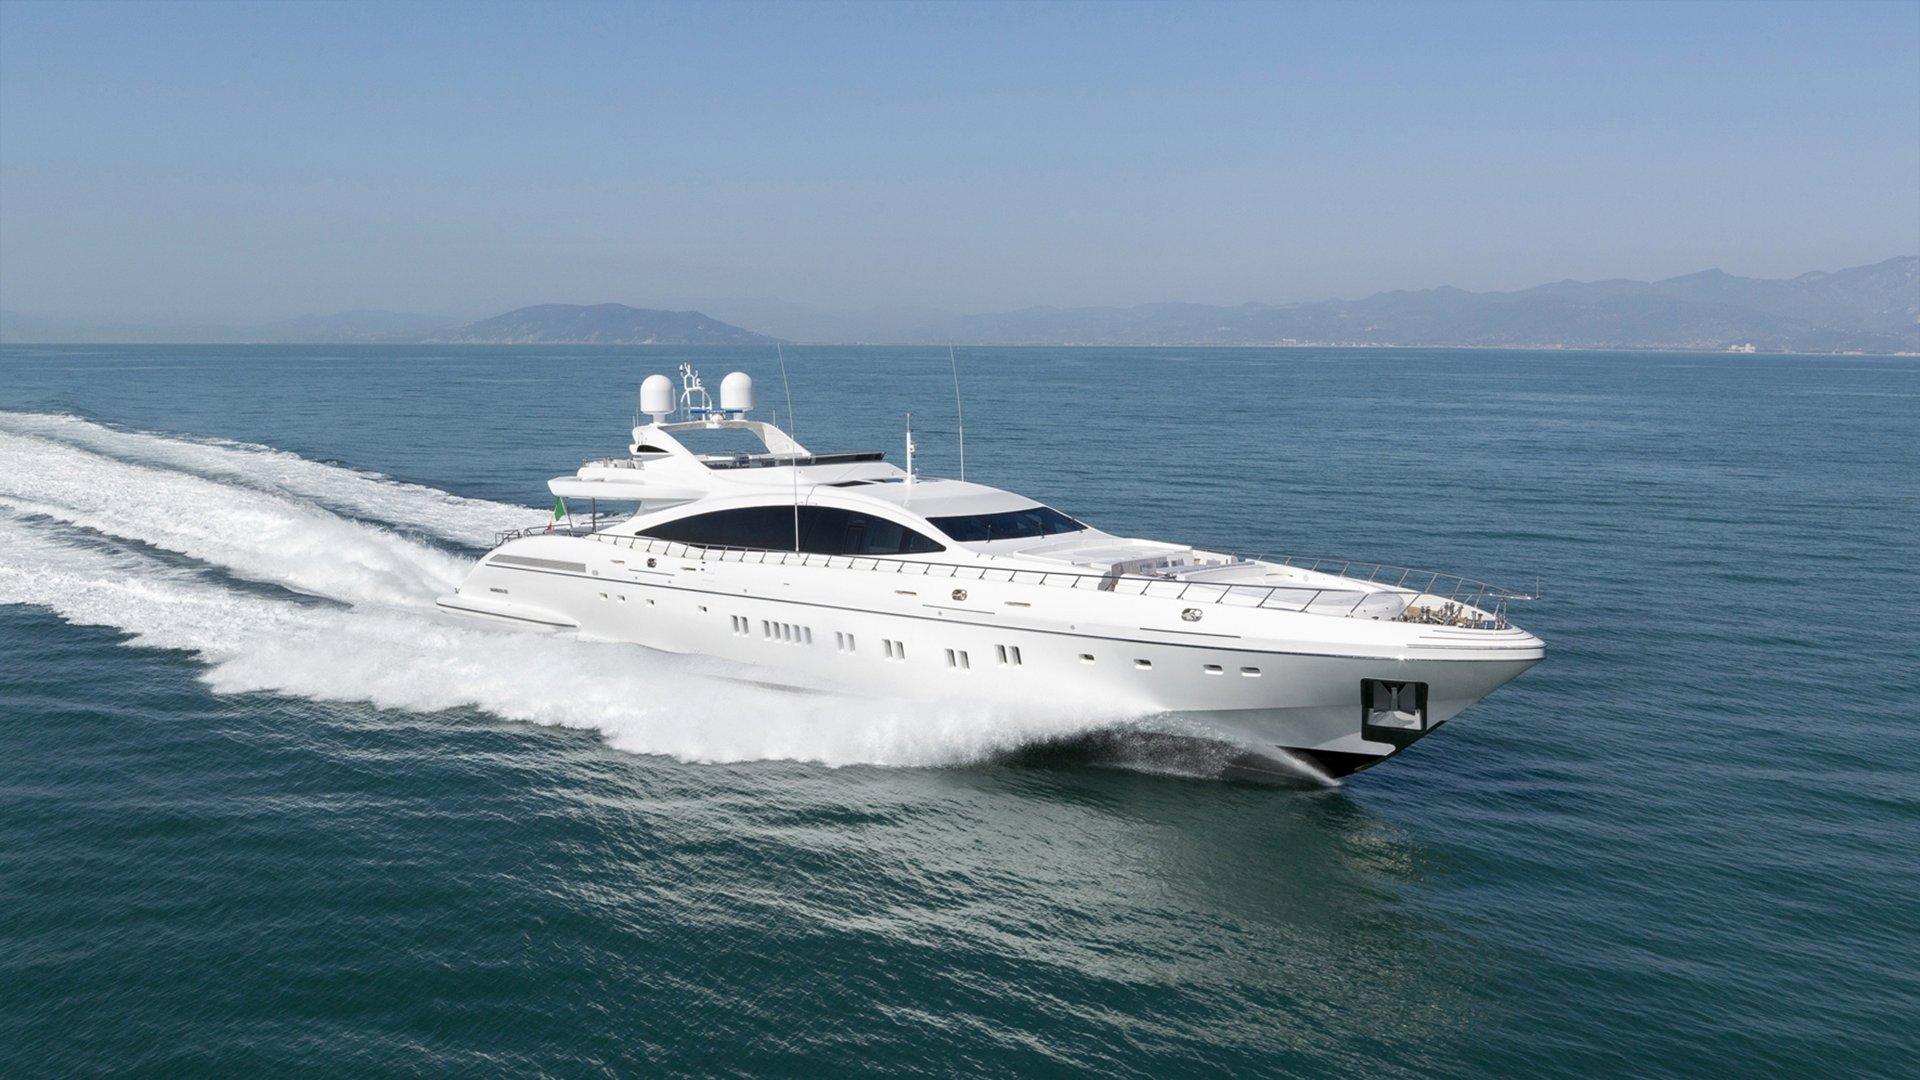 CHARTER - yacht da vinci 201708 running 02 59896afa910fd v default big 1